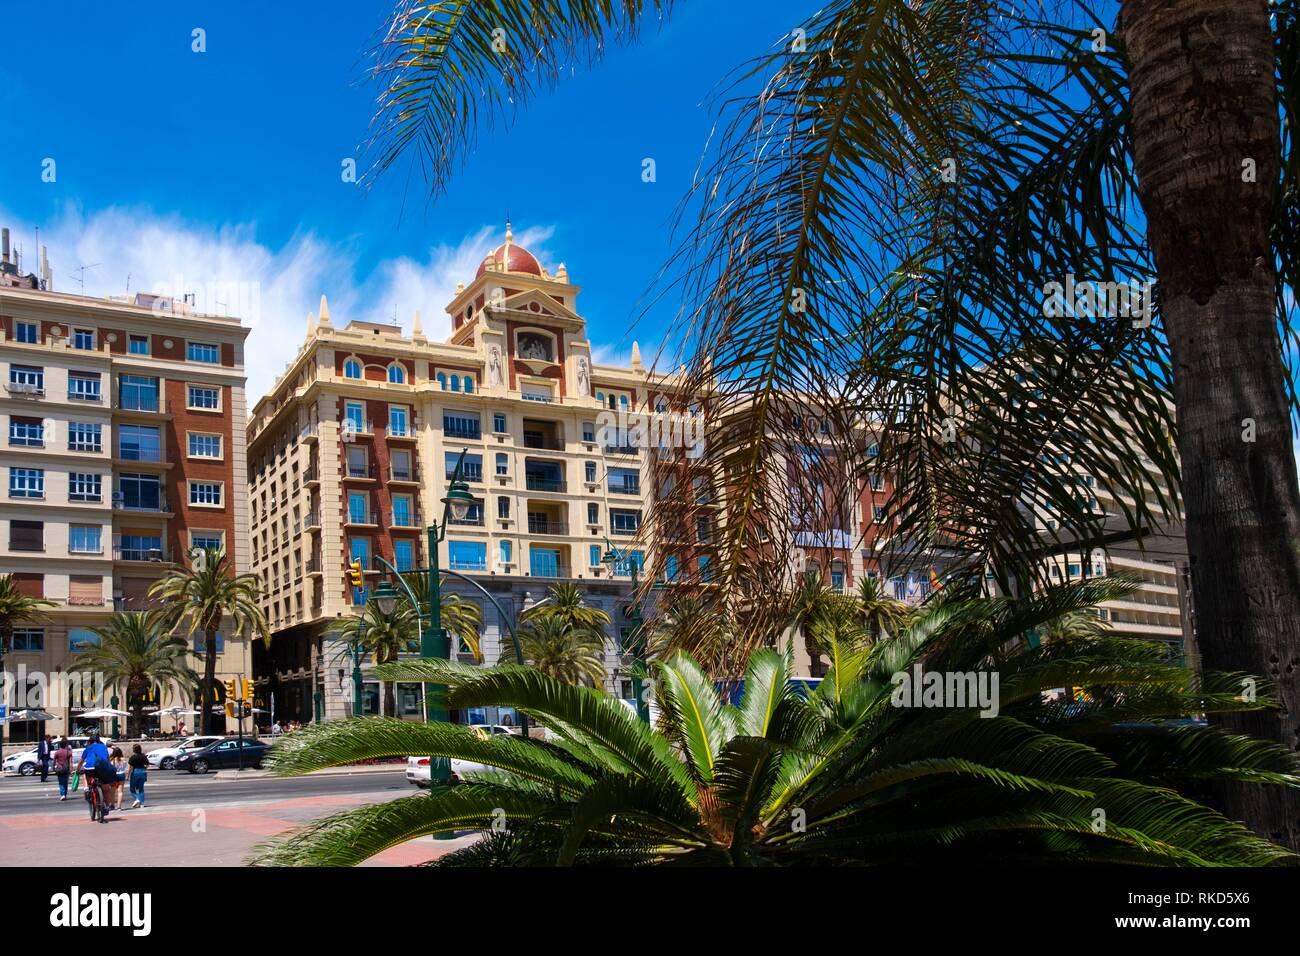 Alameda Principal, at Malaga, Andalusia, Spain. - Stock Image